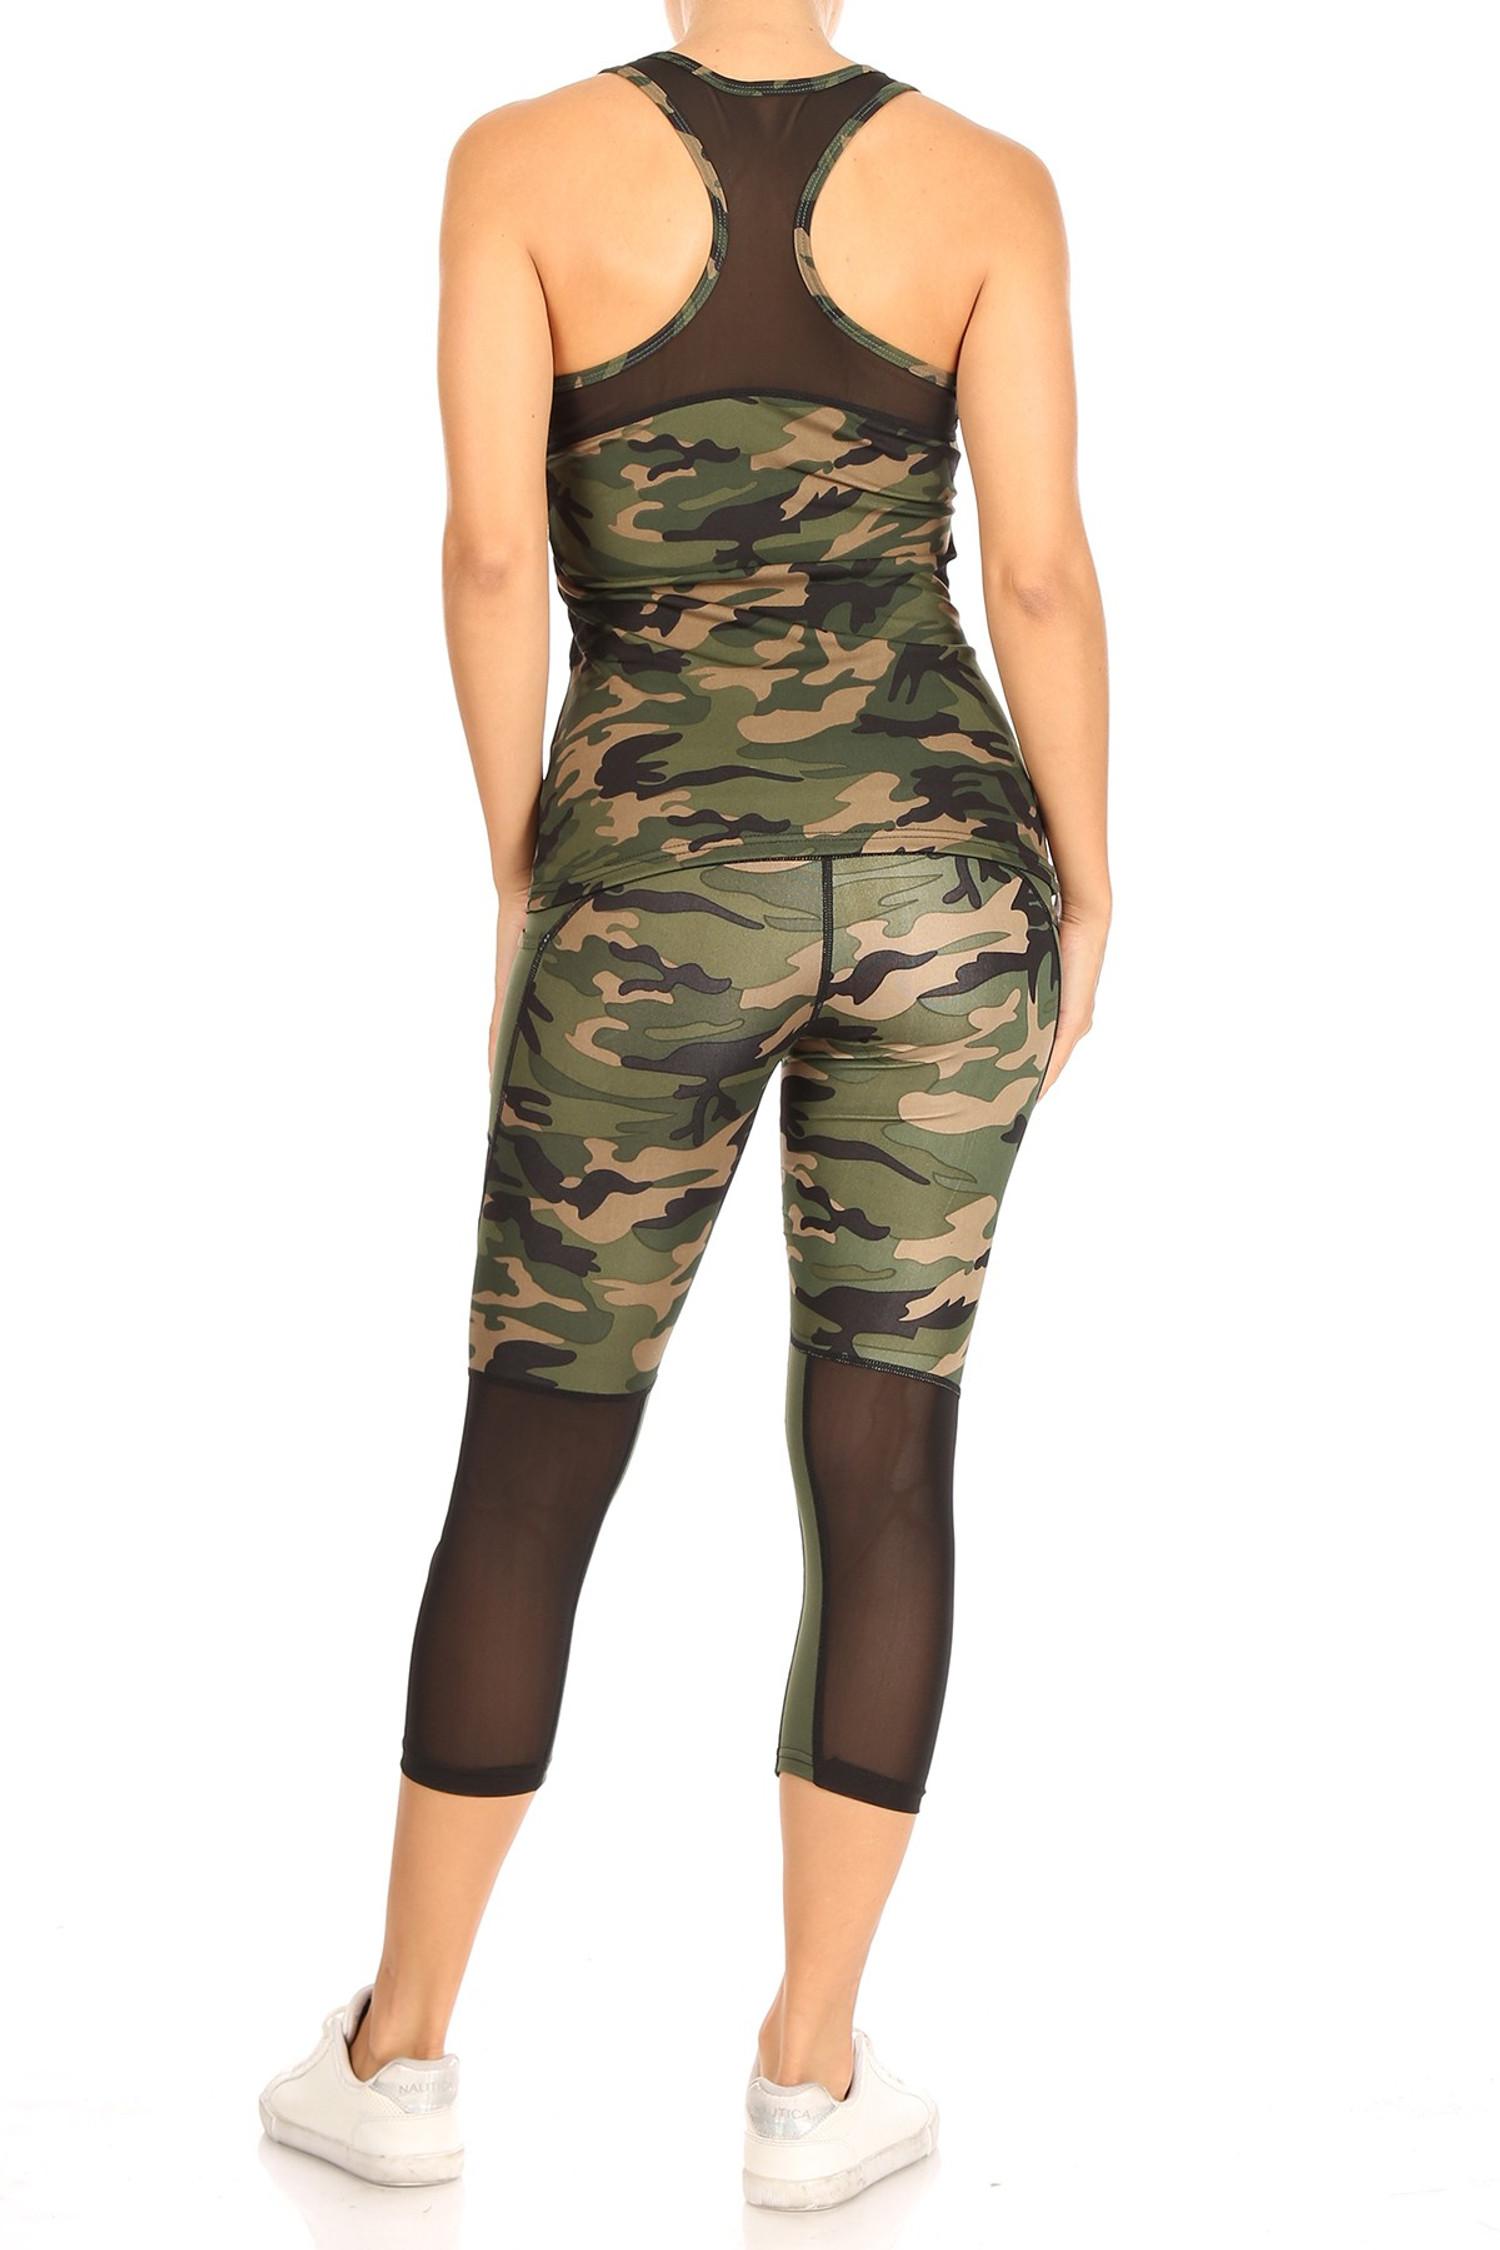 Camouflage Sport Mesh Top and Capri Set